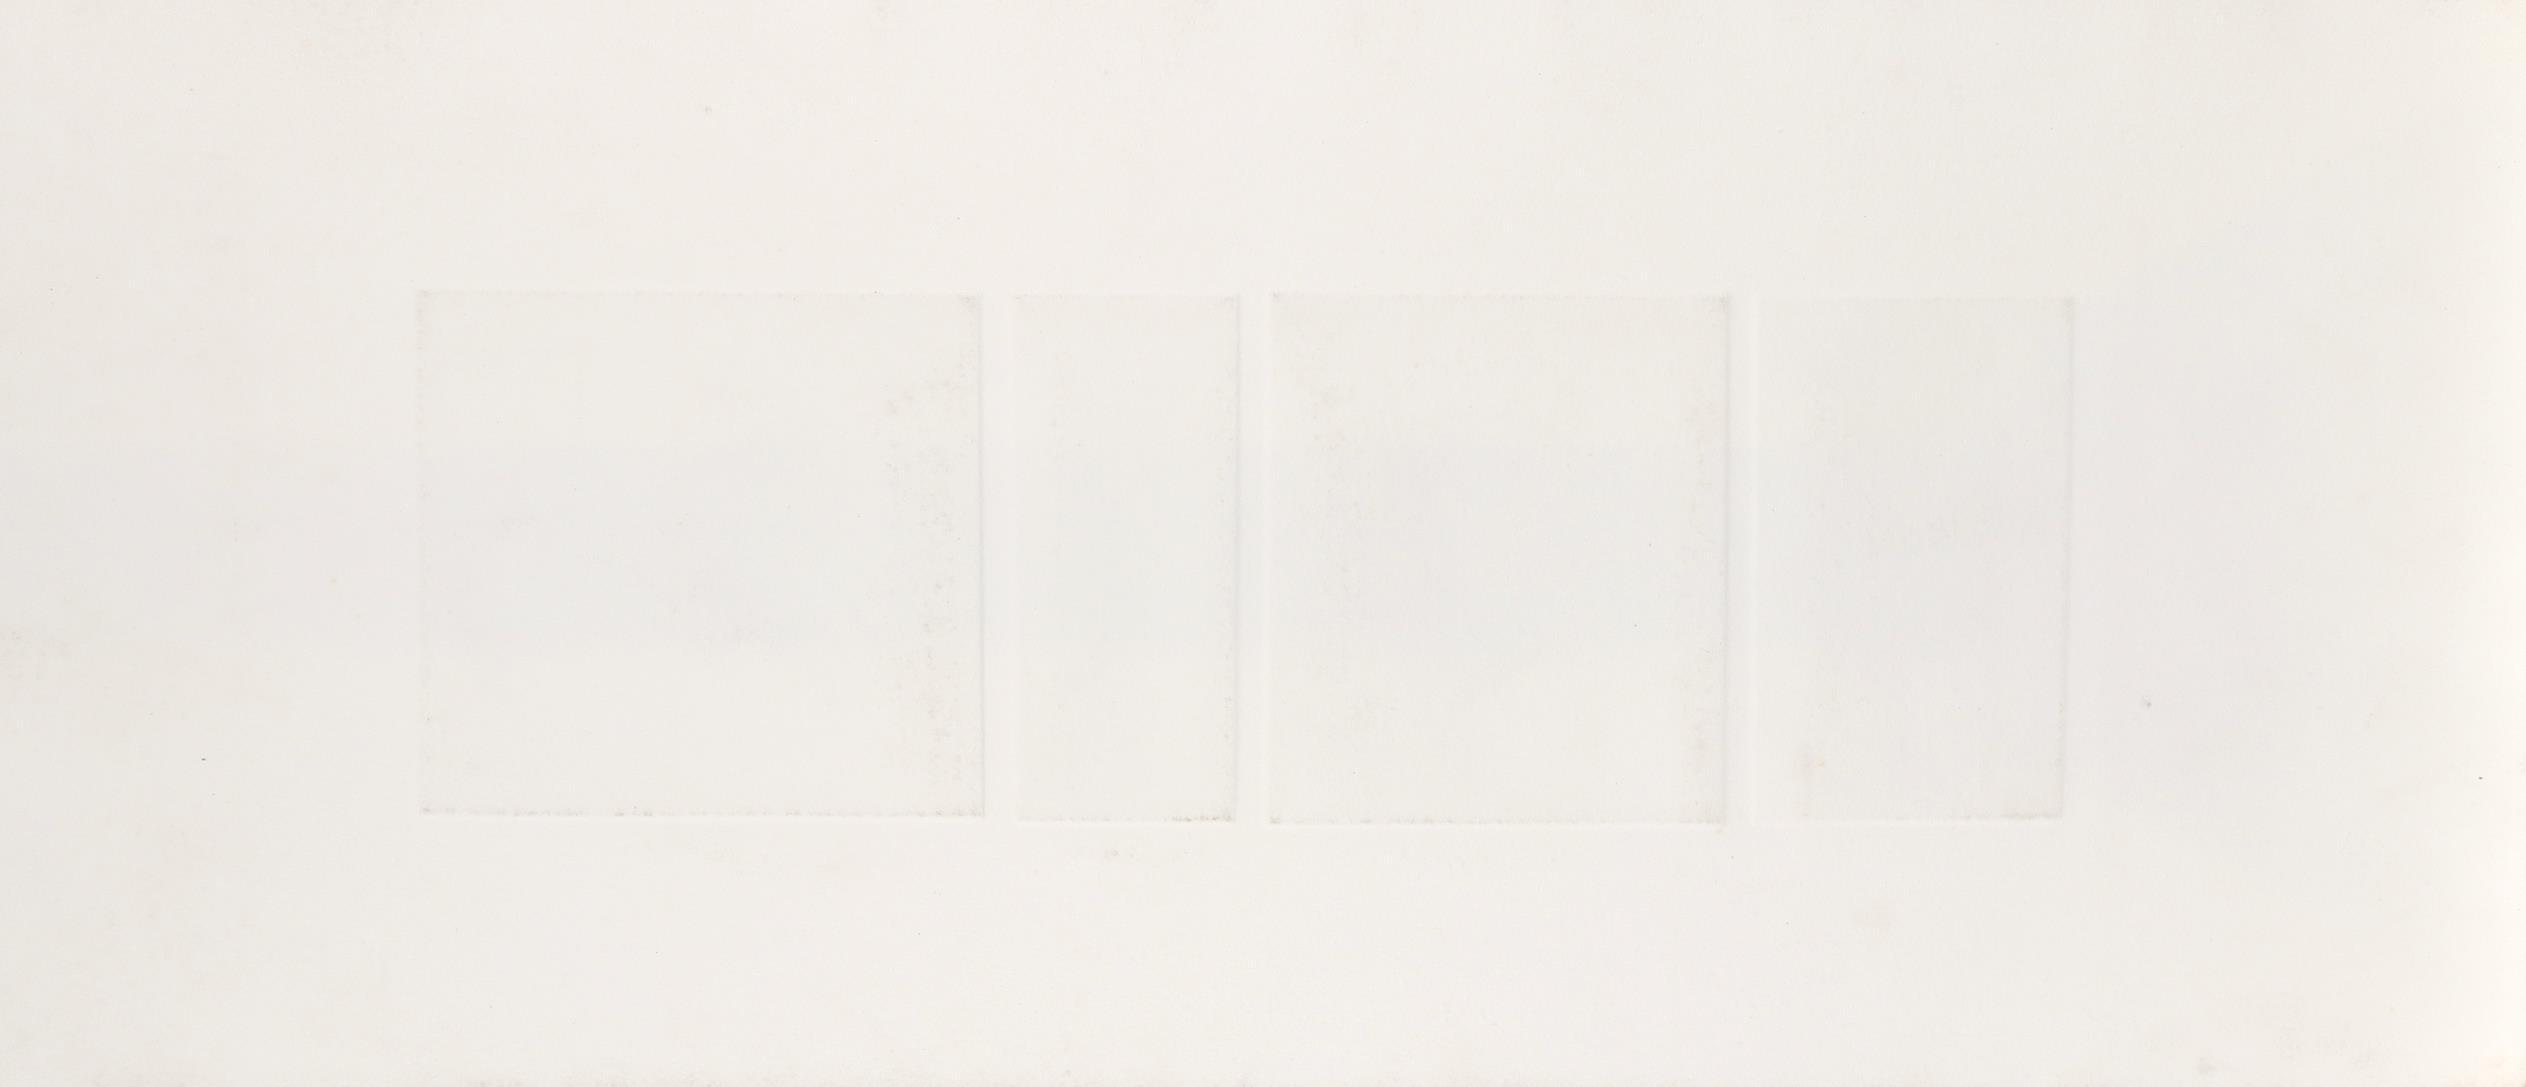 ‡David Hockney, OM, CH, RA (b.1937) Study for Rumpelstiltskin Four etchings on one sheet, trial - Image 3 of 3